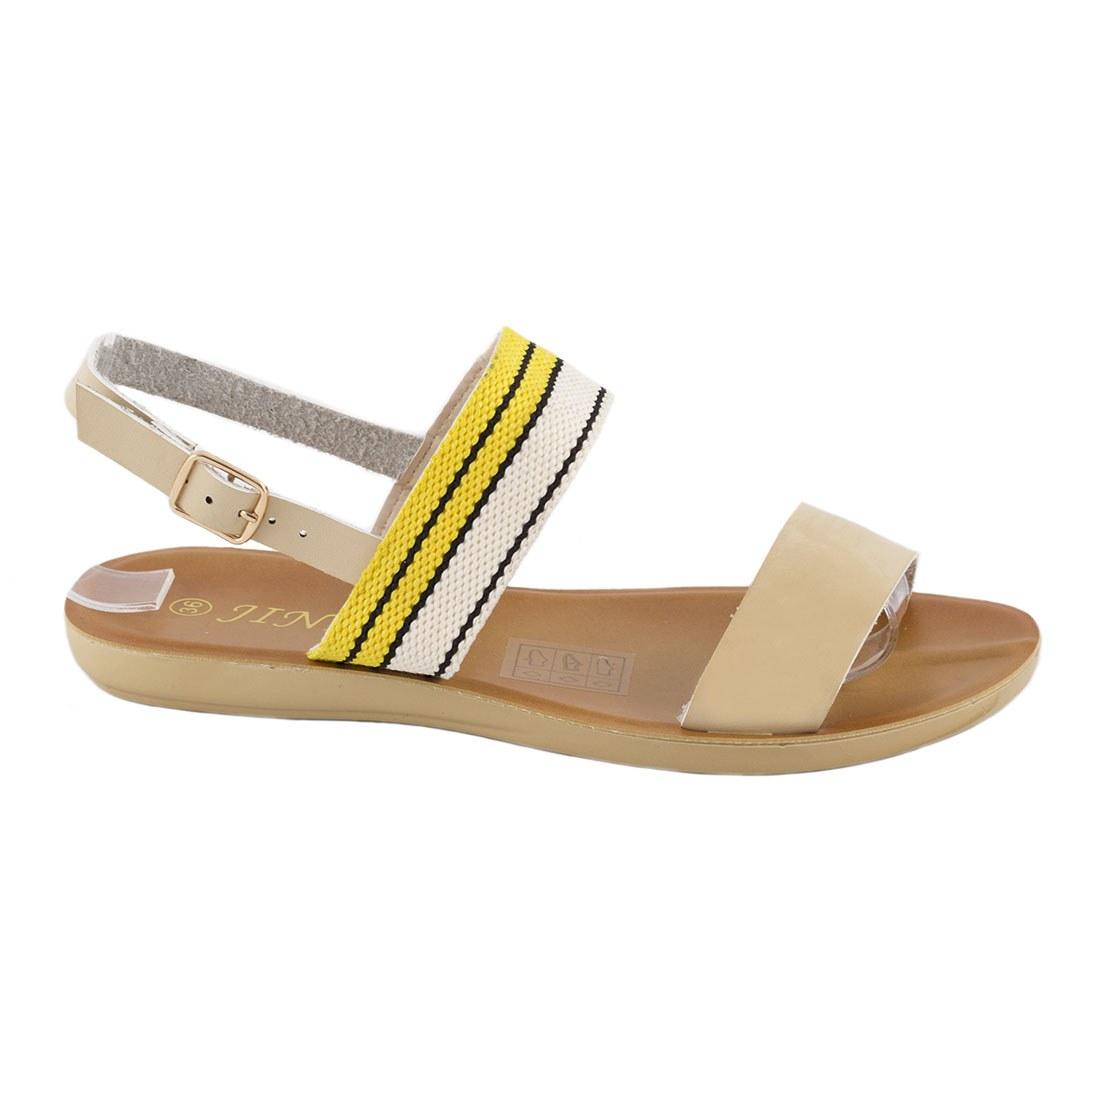 Sandale dama cu barete WS-20184-BEJ